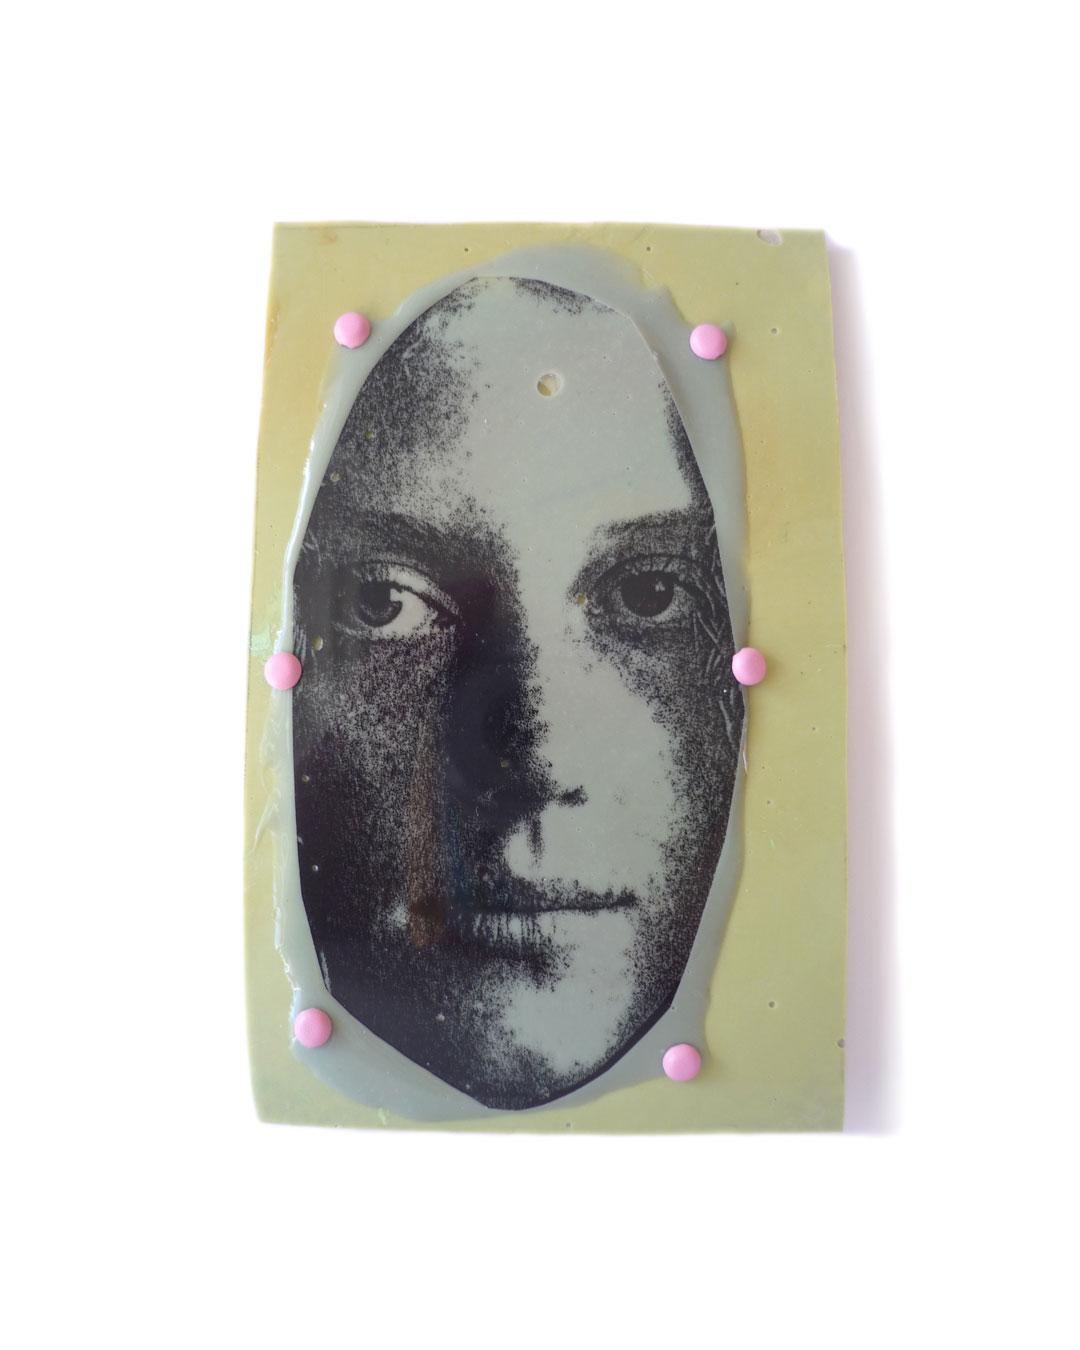 Margit Jäschke, untitled, 2012, brooch; corrugated board, epoxy, pin, silver, 118 x 70 x 9 mm, €1340